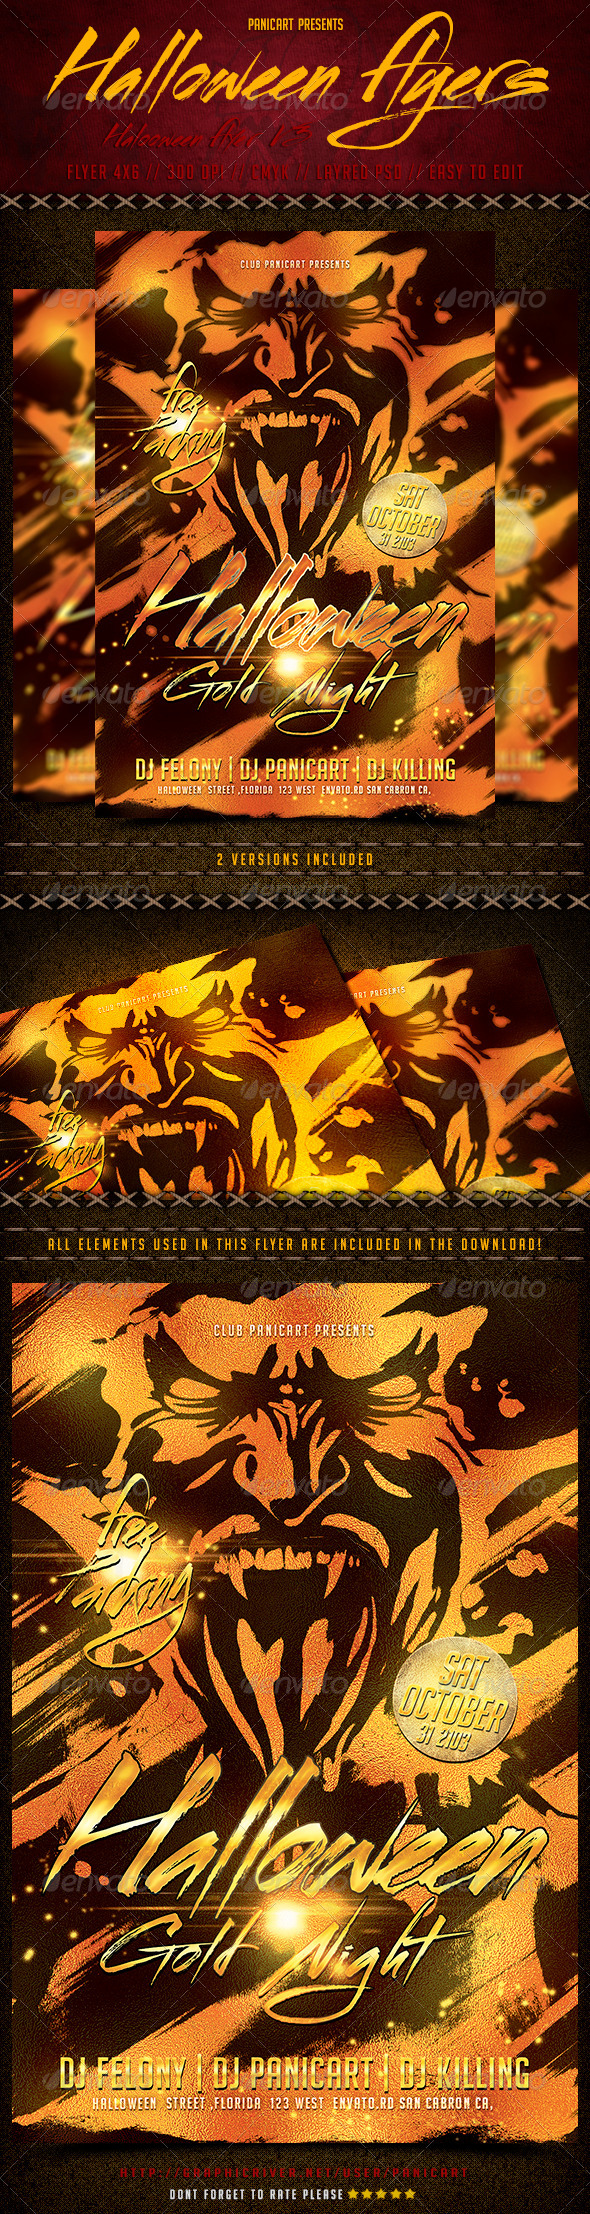 halloween flyer templete v3 graphicriver halloween gold night